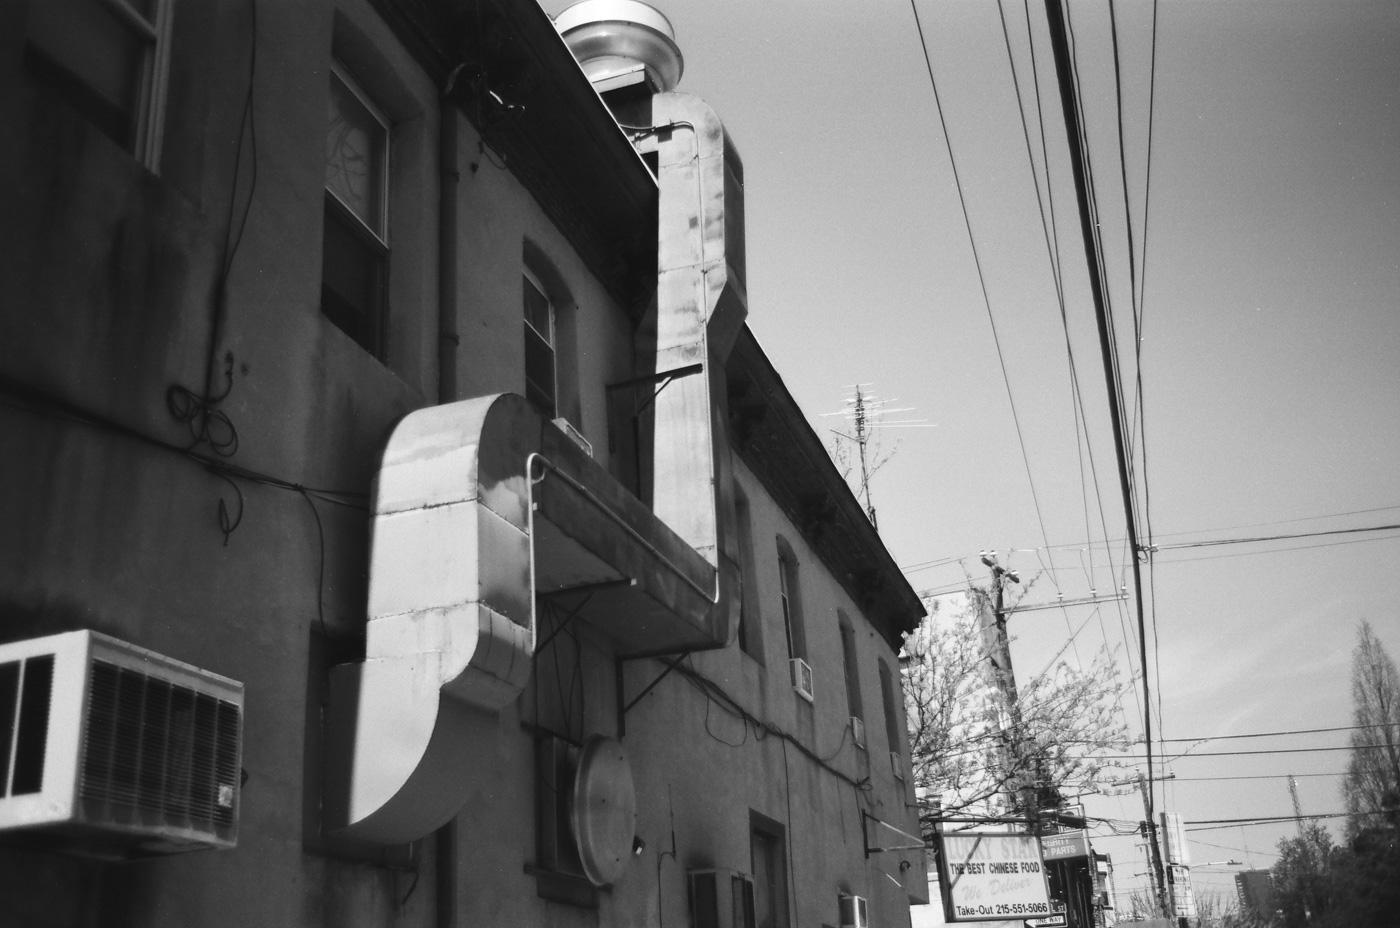 Exterior Ductwork